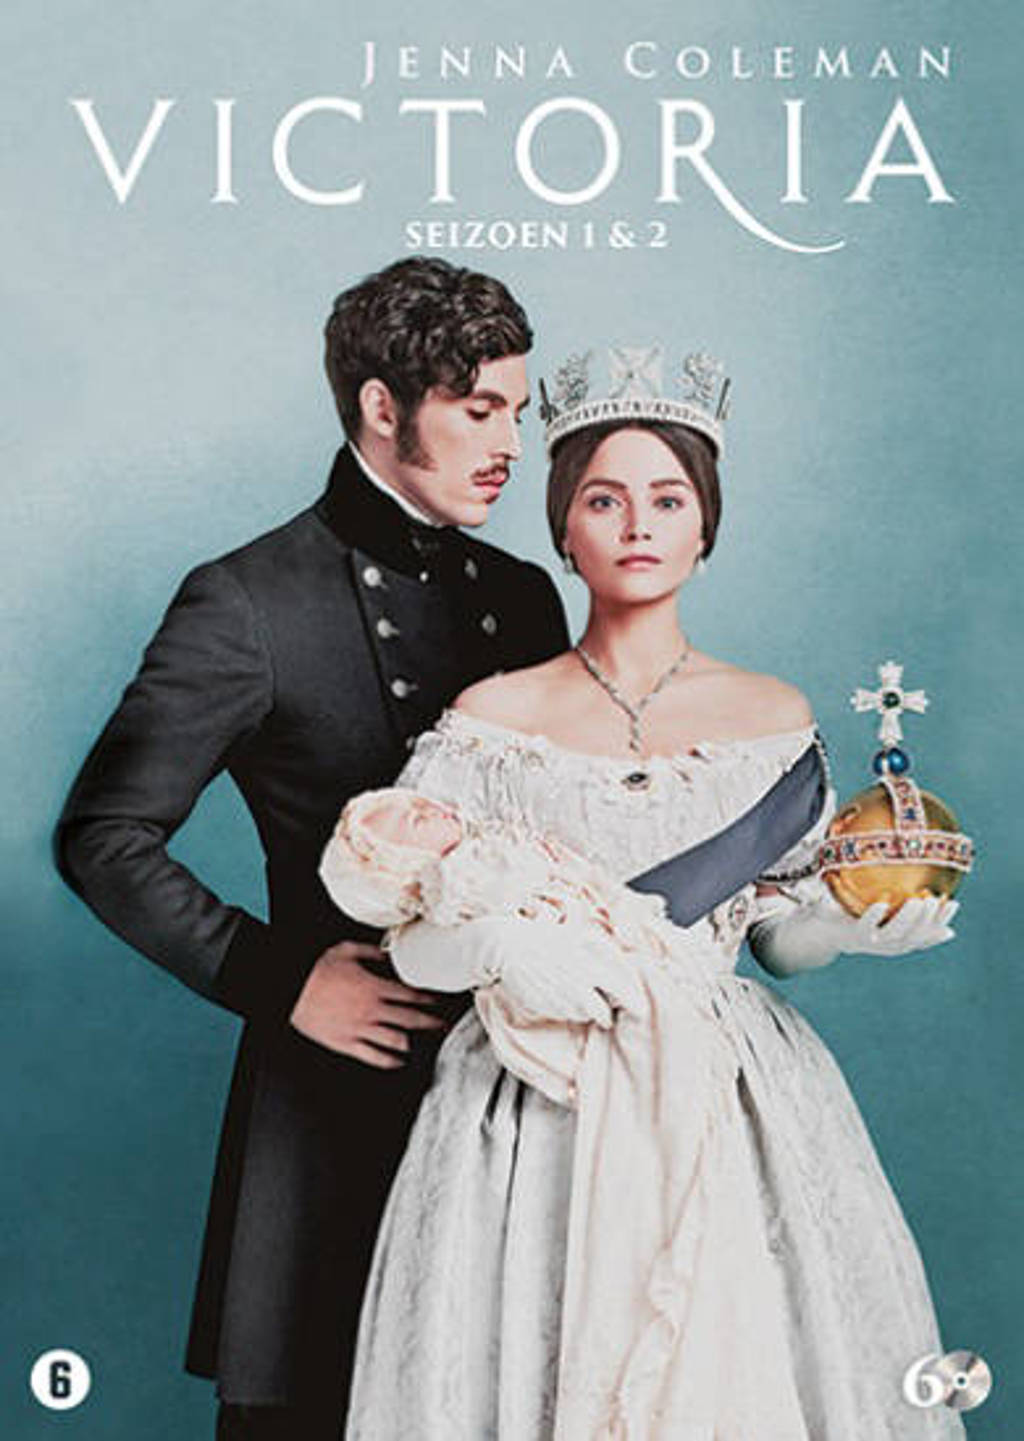 Victoria - Seizoen 1 & 2 (DVD)